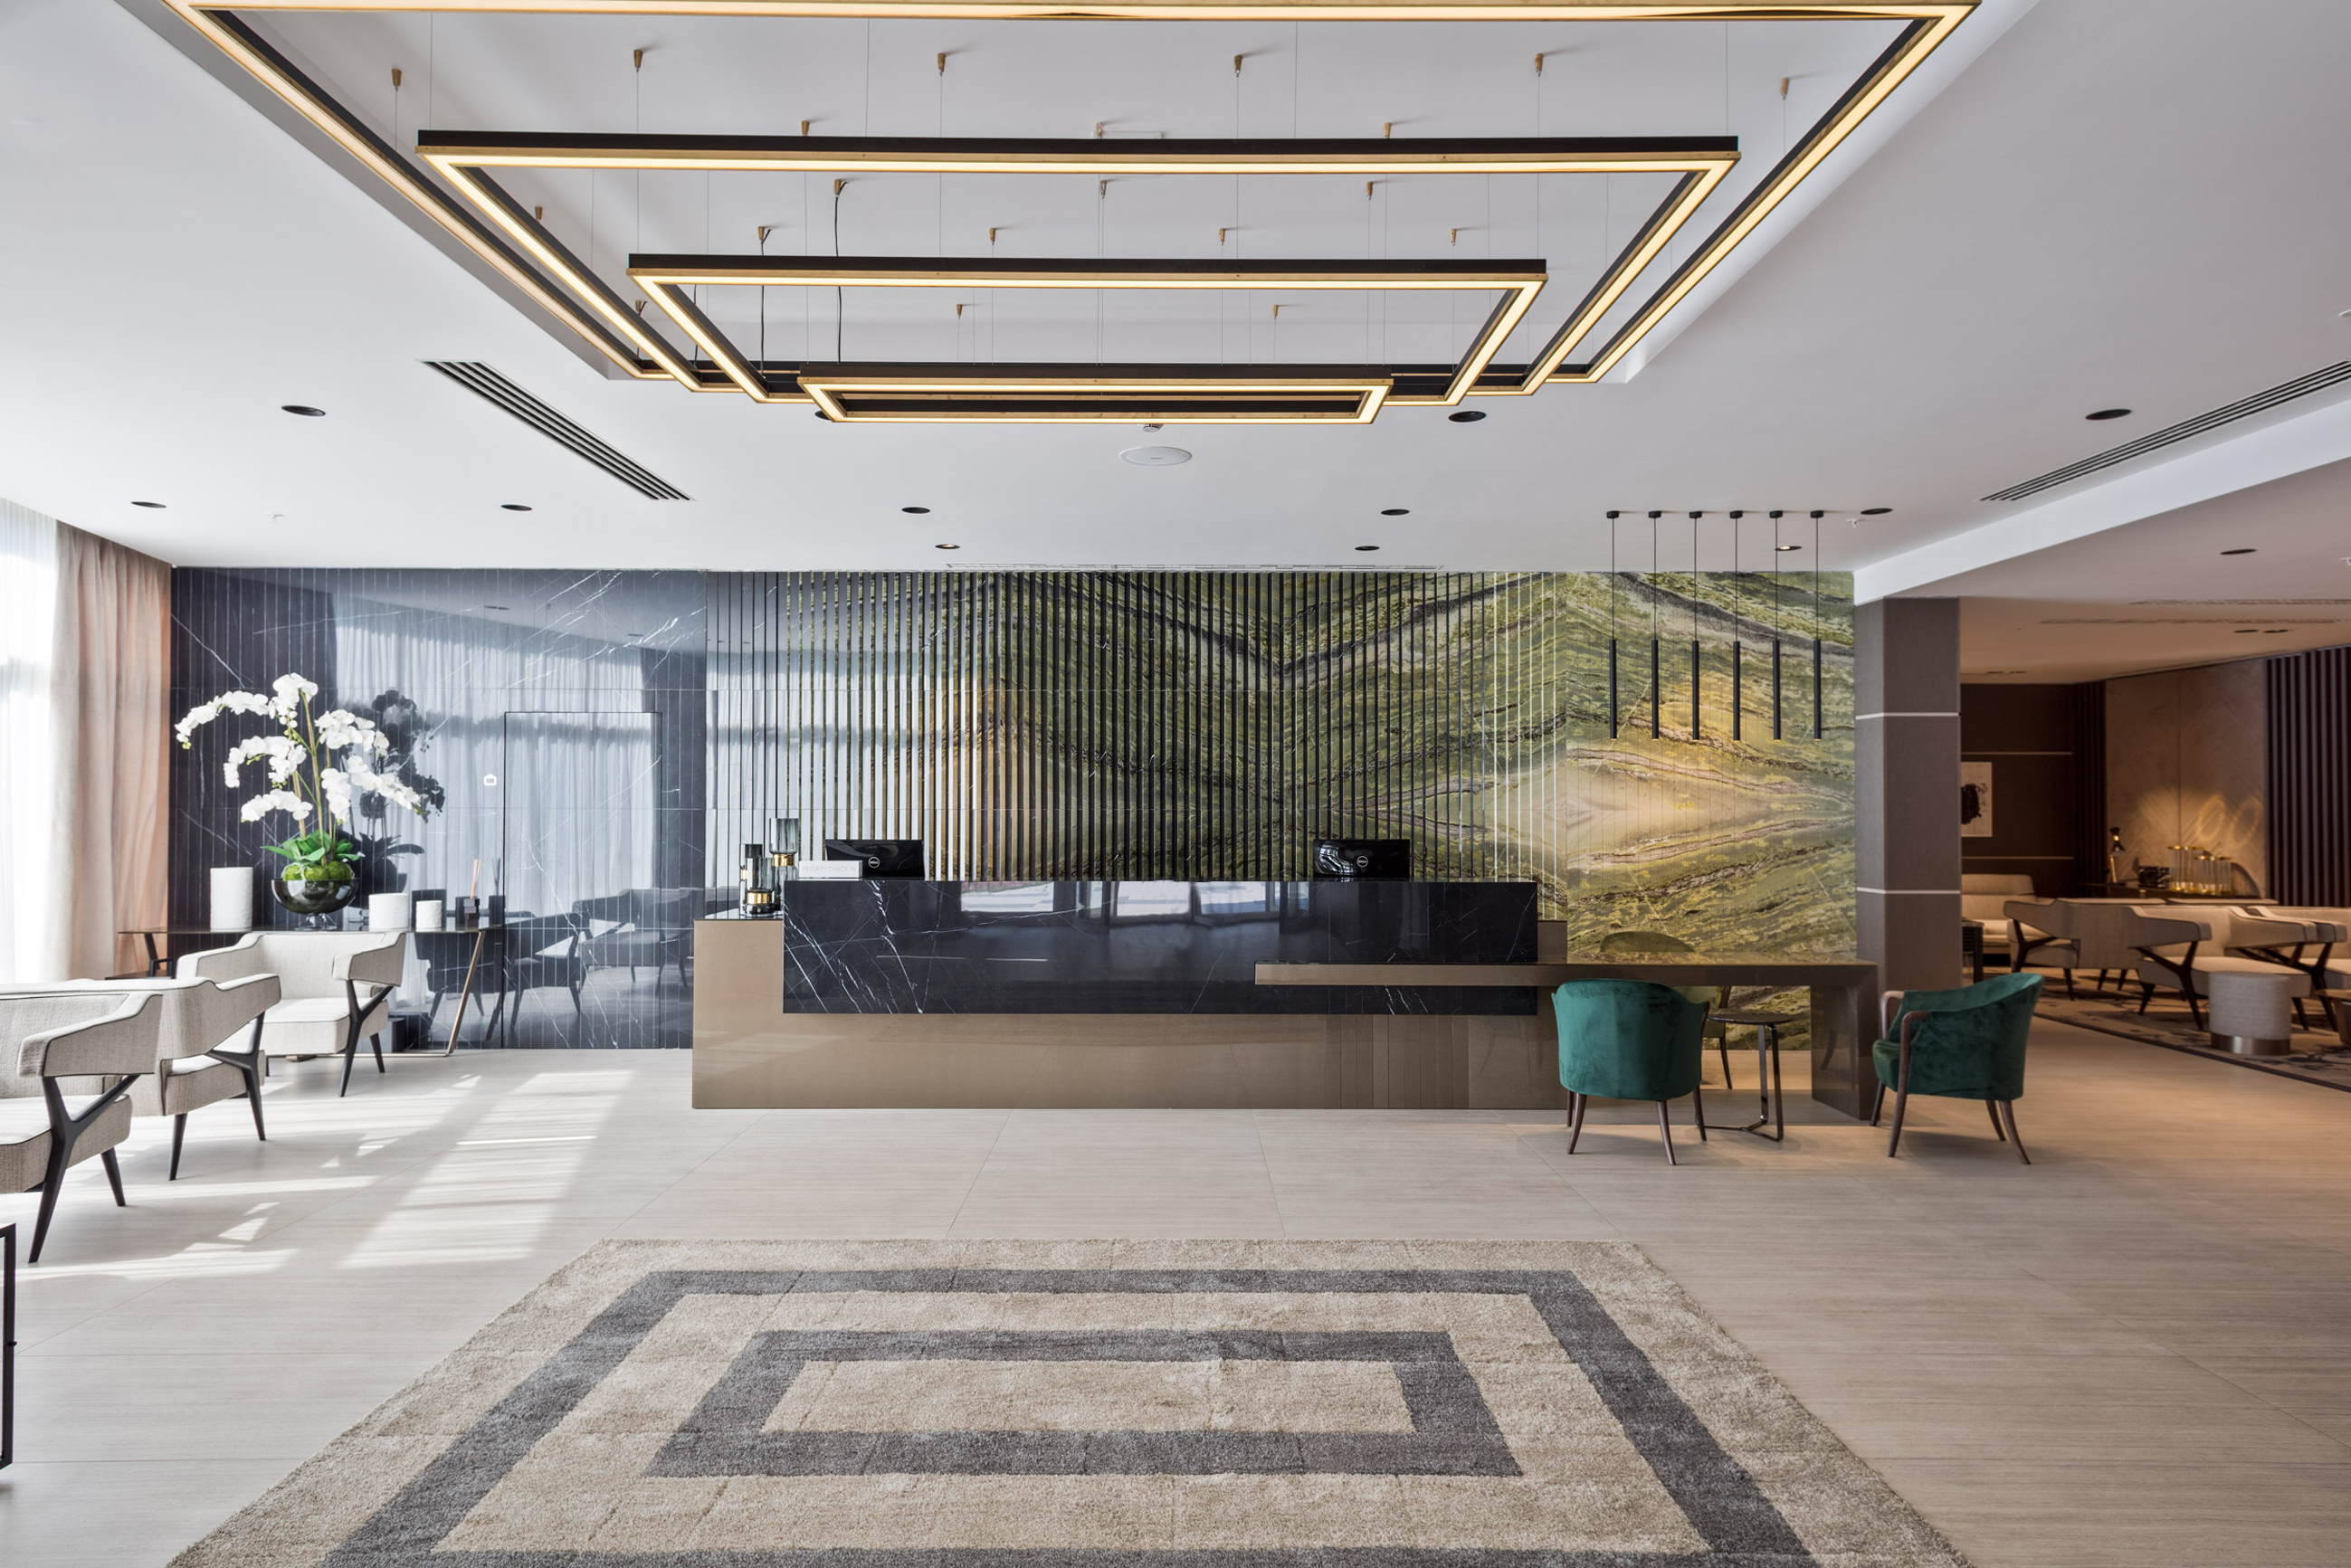 Enterijer hotela Melia 5*